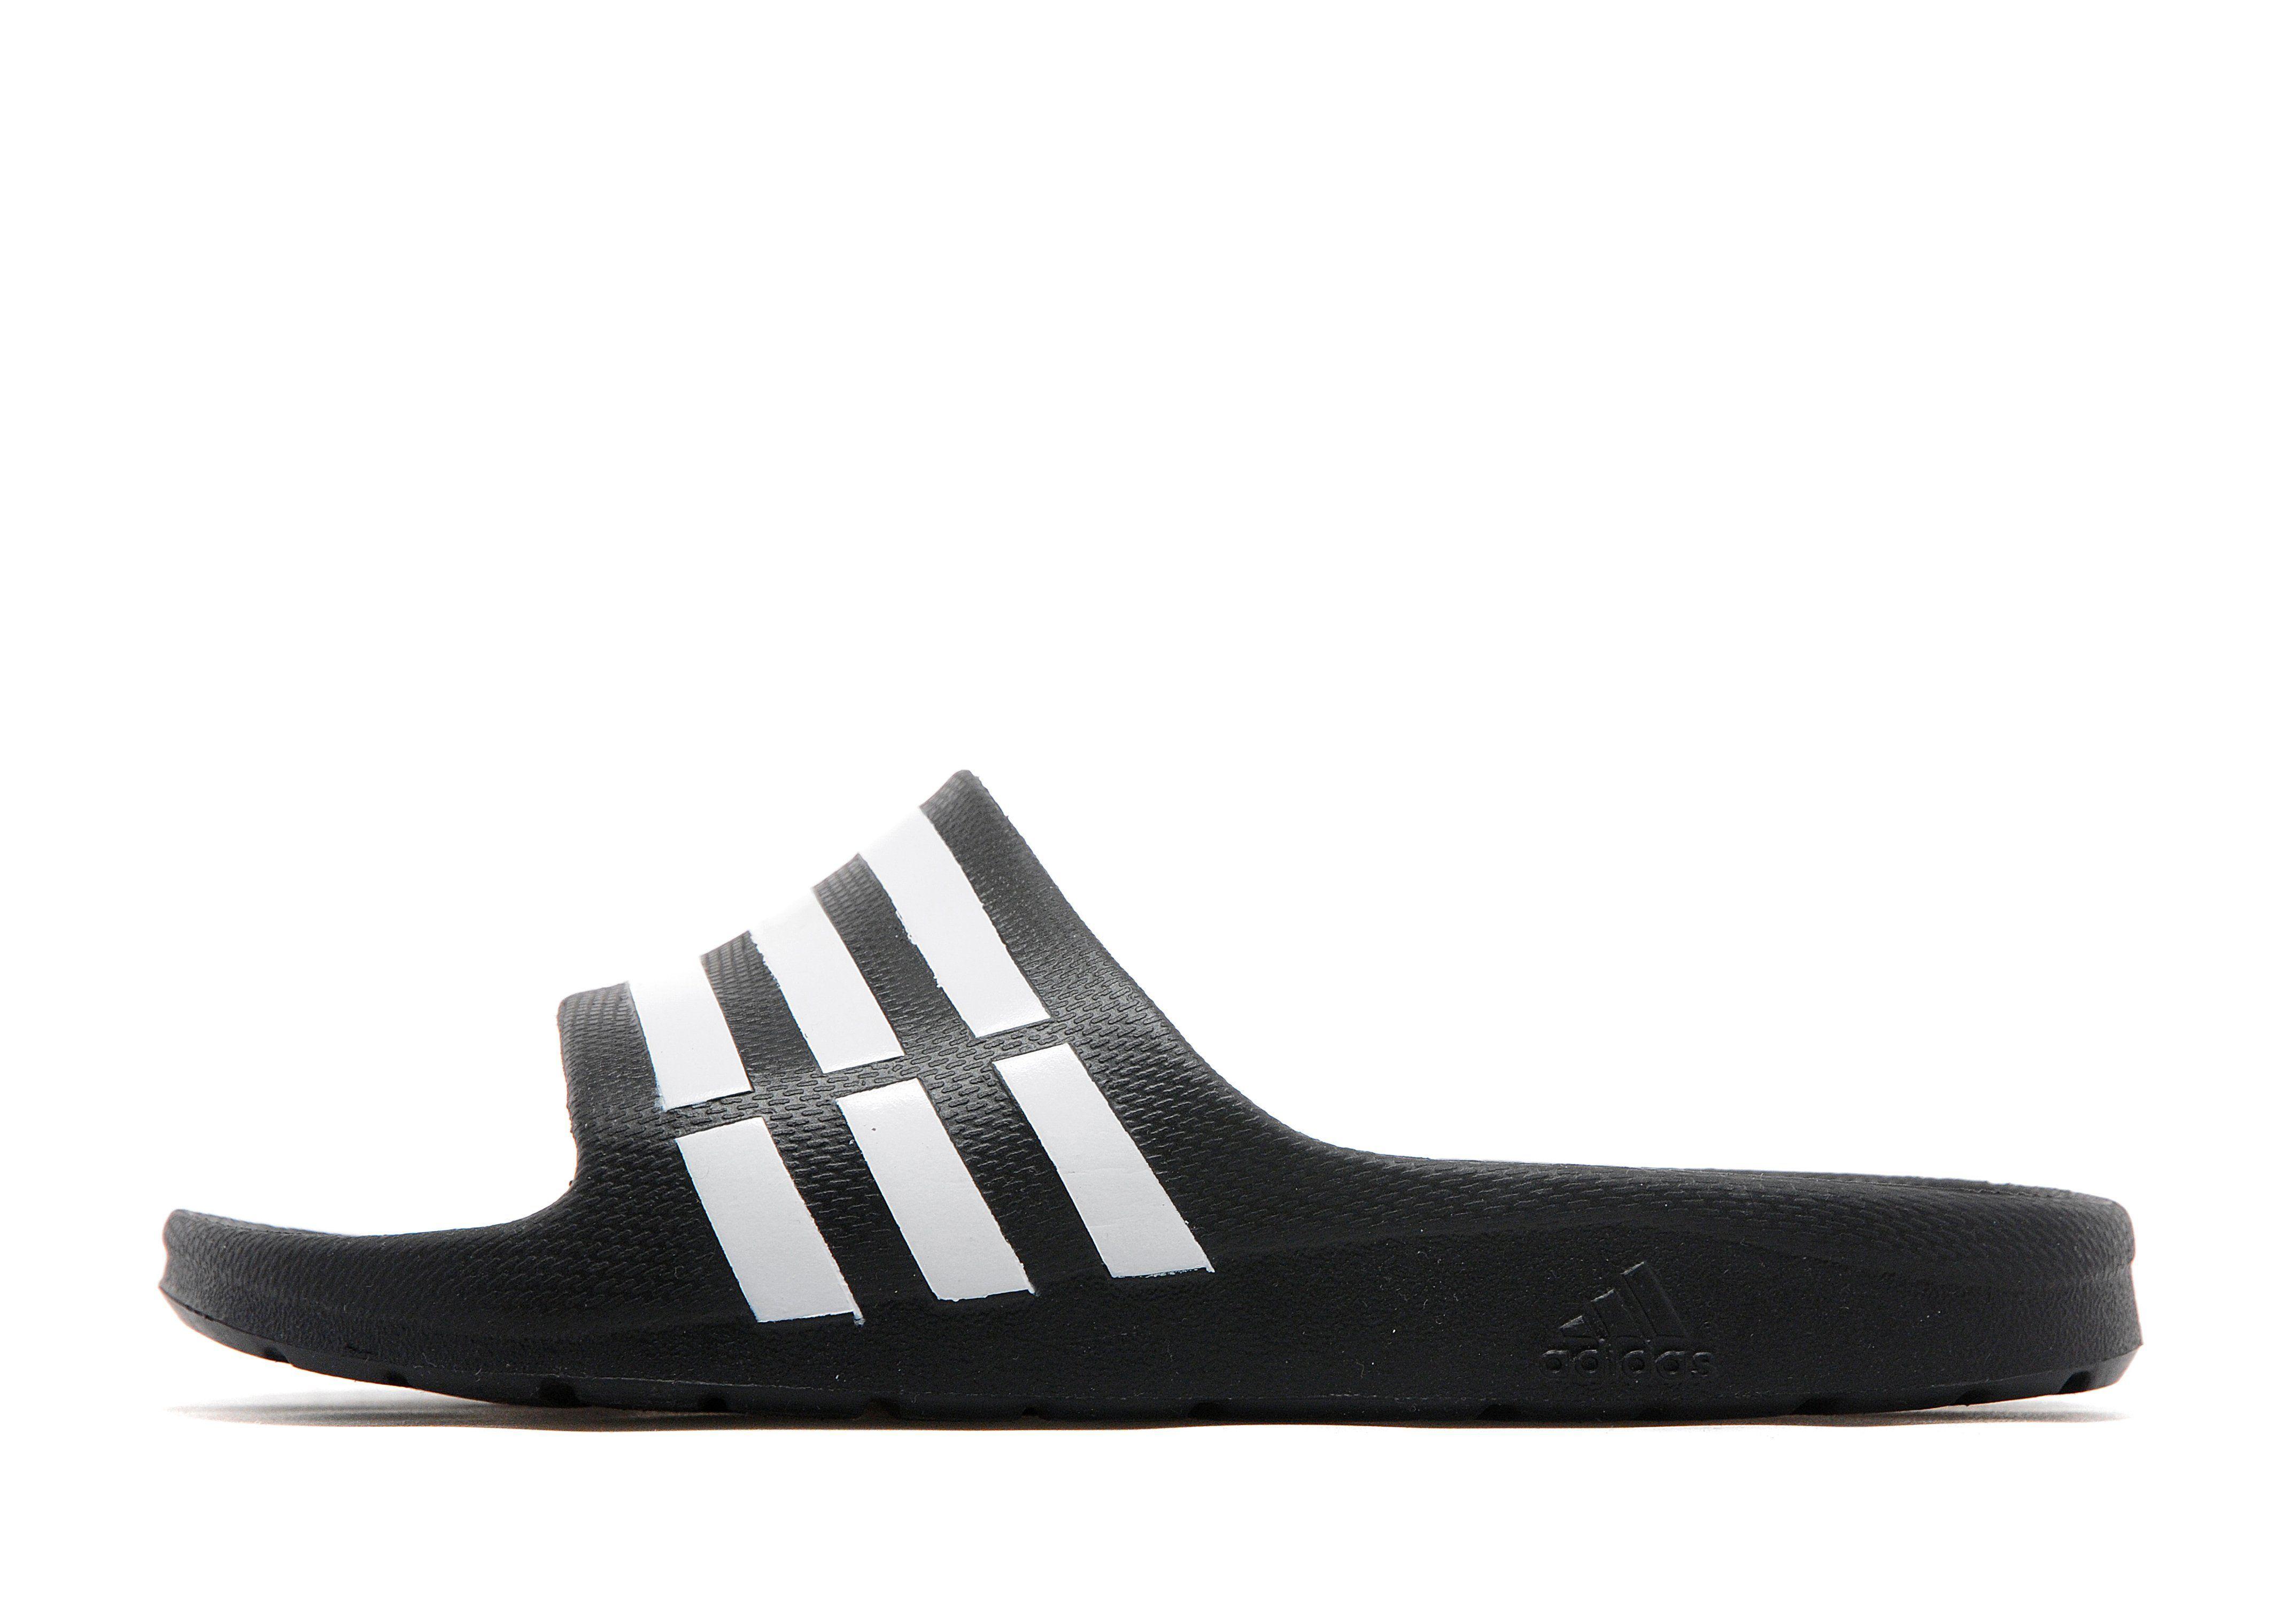 adidas Duramo Slide Junior - Shop online for adidas Duramo Slide Junior with JD Sports, the UK's leading sports fashion retailer.